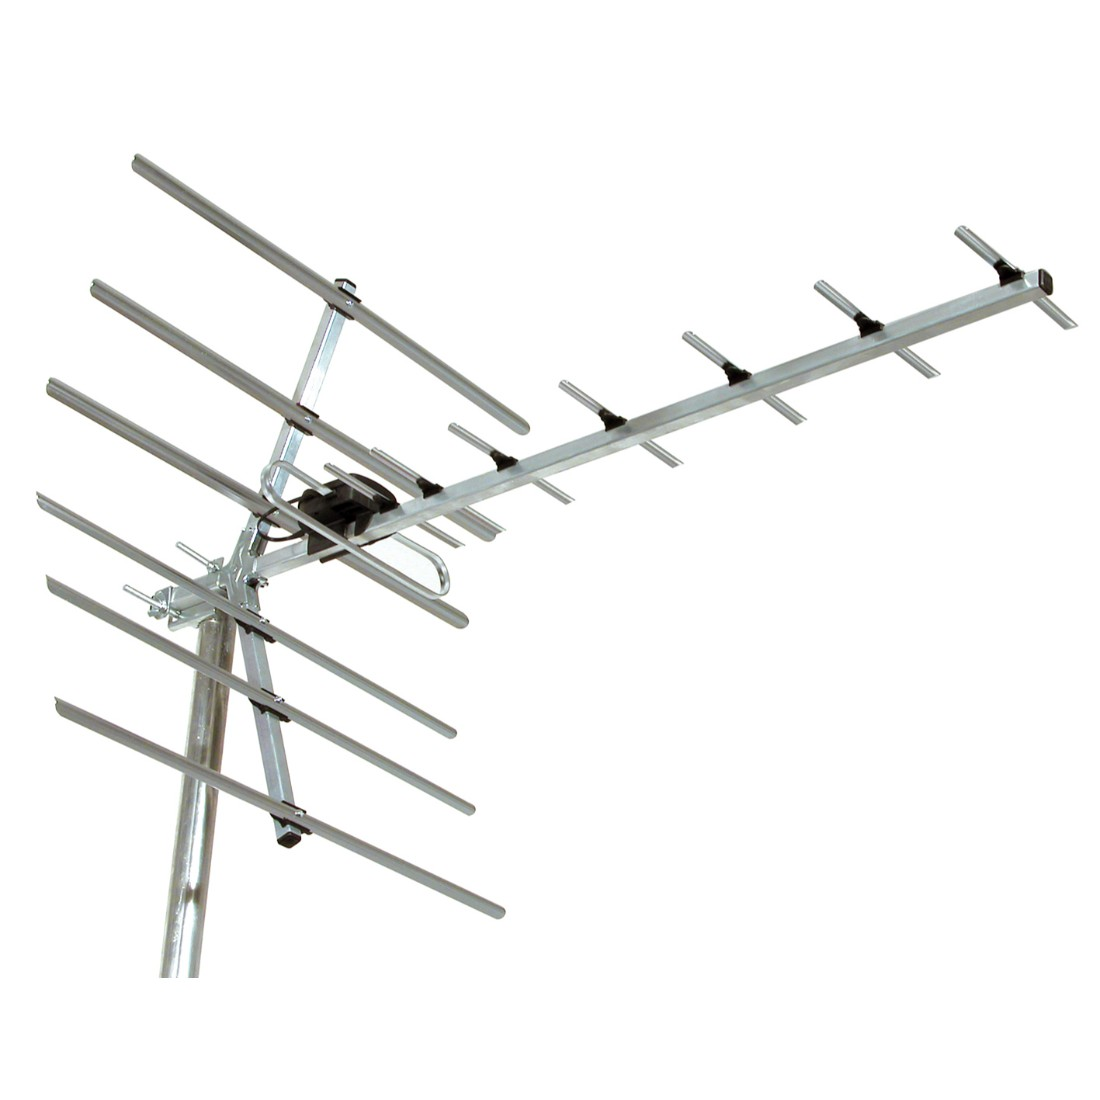 slx 4g 14 element digital tv aerial